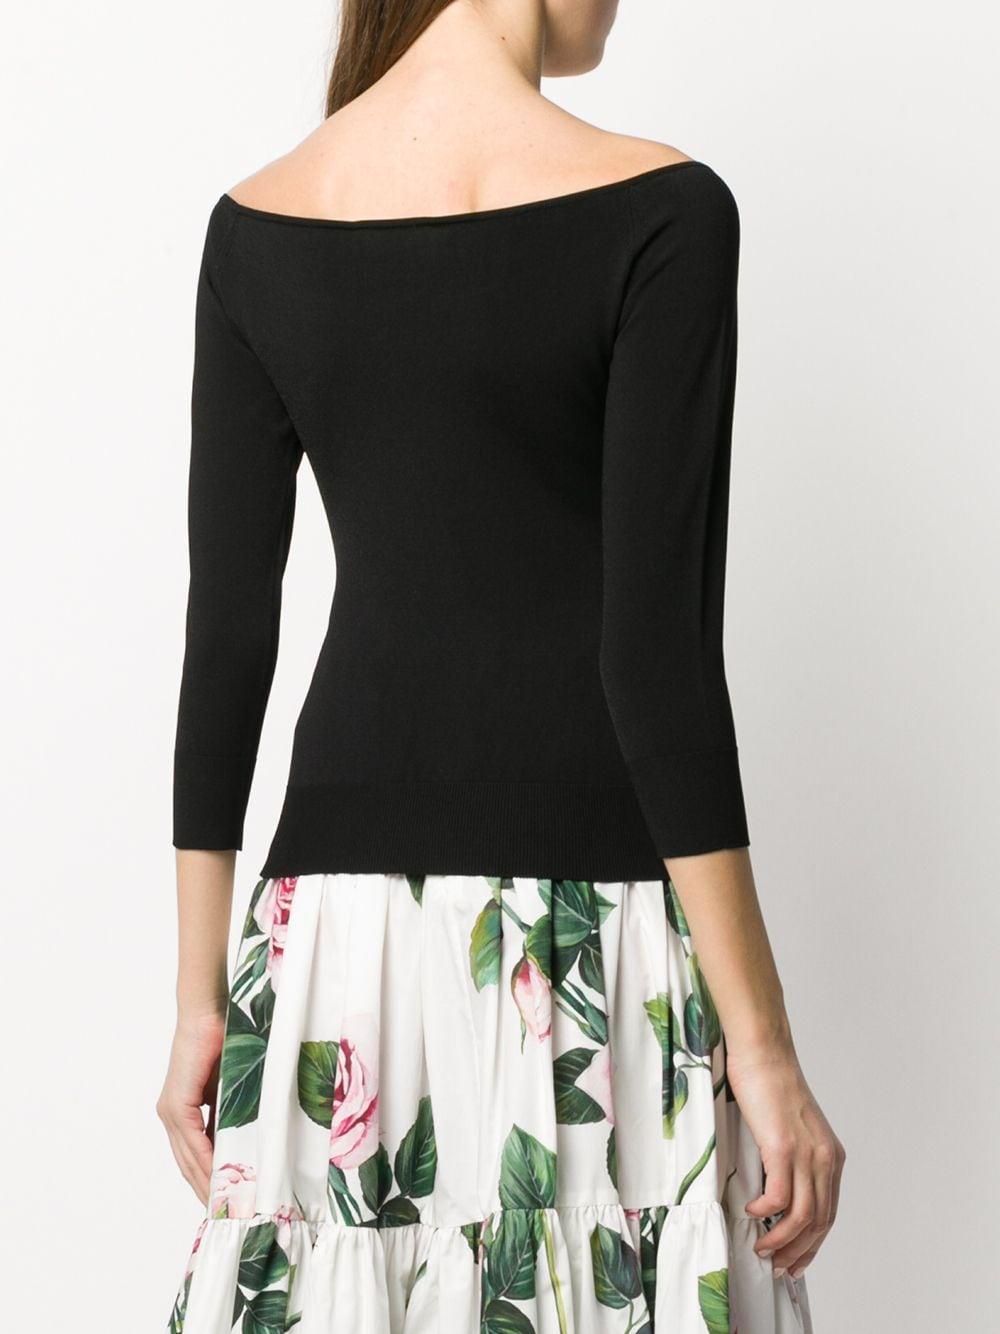 Top con hombros descubiertos Dolce & Gabbana de Tejido sintético de color Negro